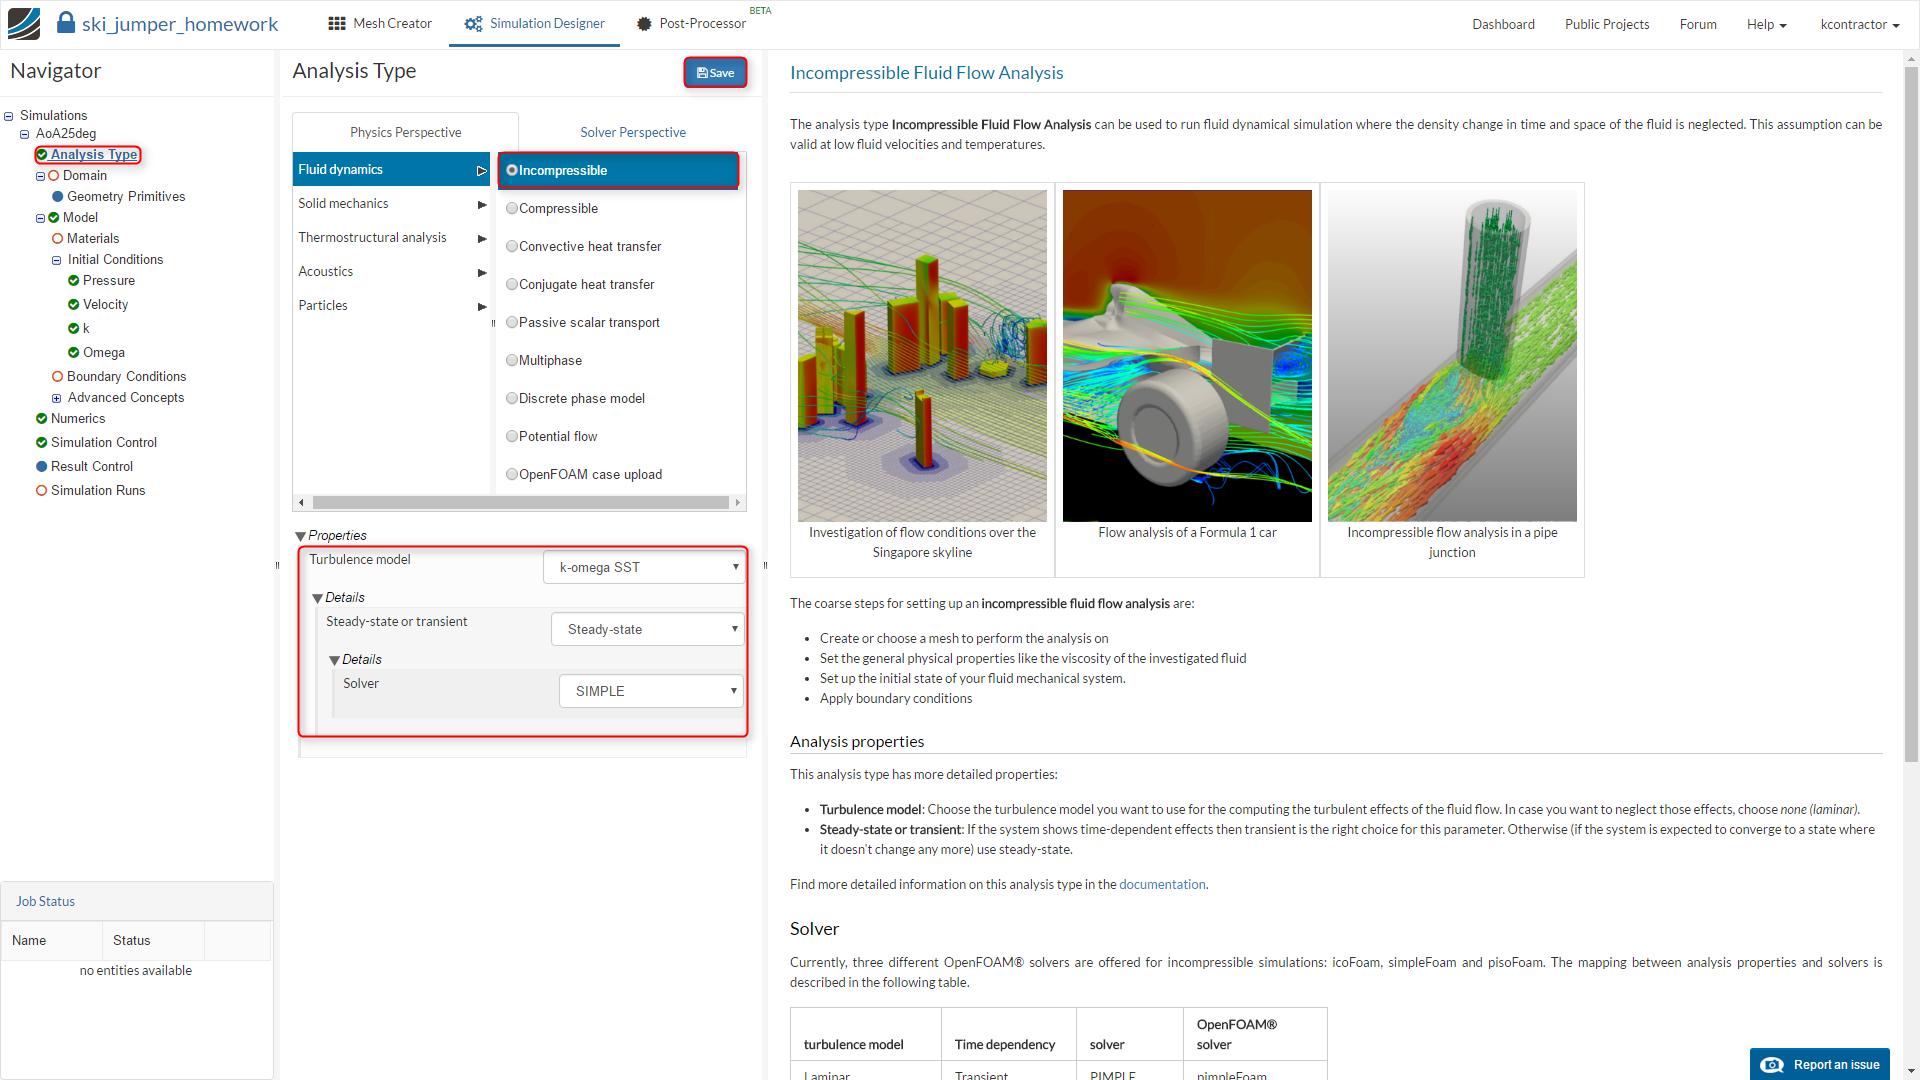 sports aerodynamics workshop homework step-by-step tutorial, incompressible analysis type